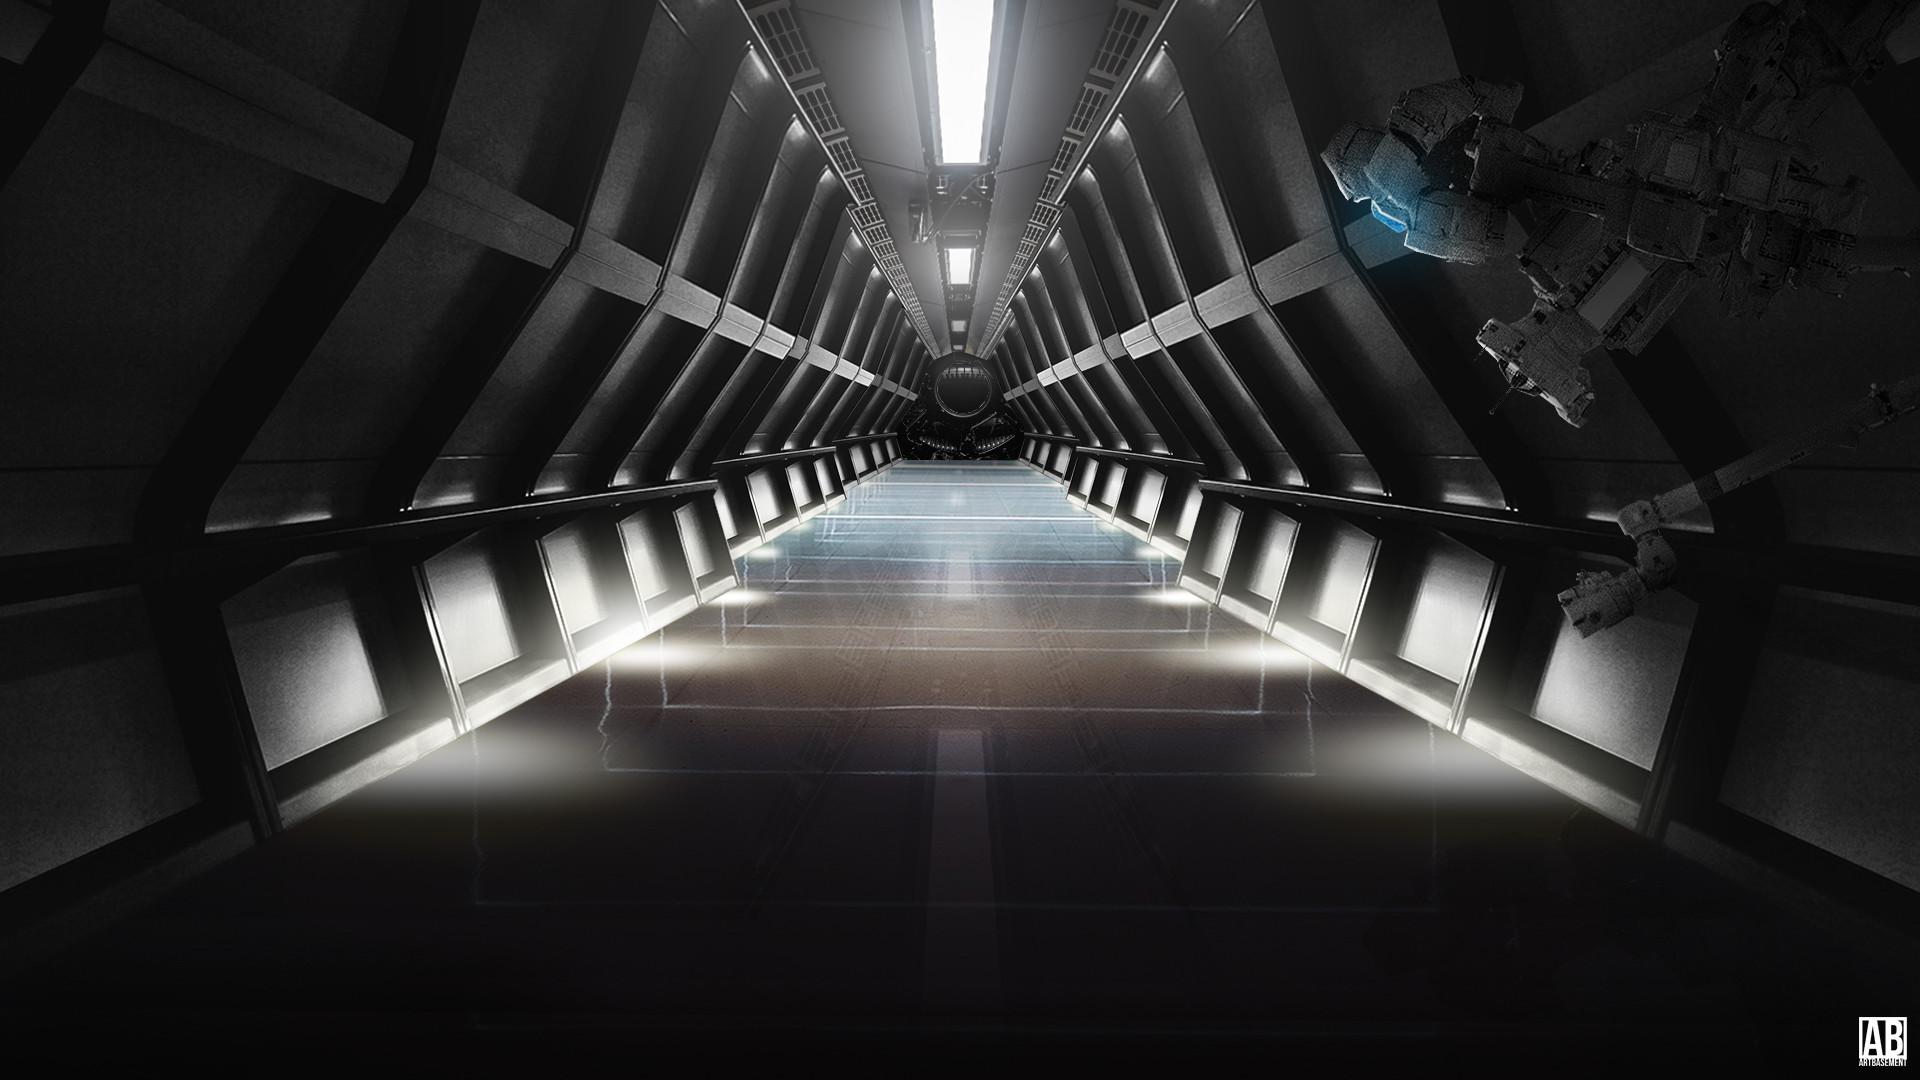 … Sci-Fi Room – Widescreen Wallpaper by ArtBasement